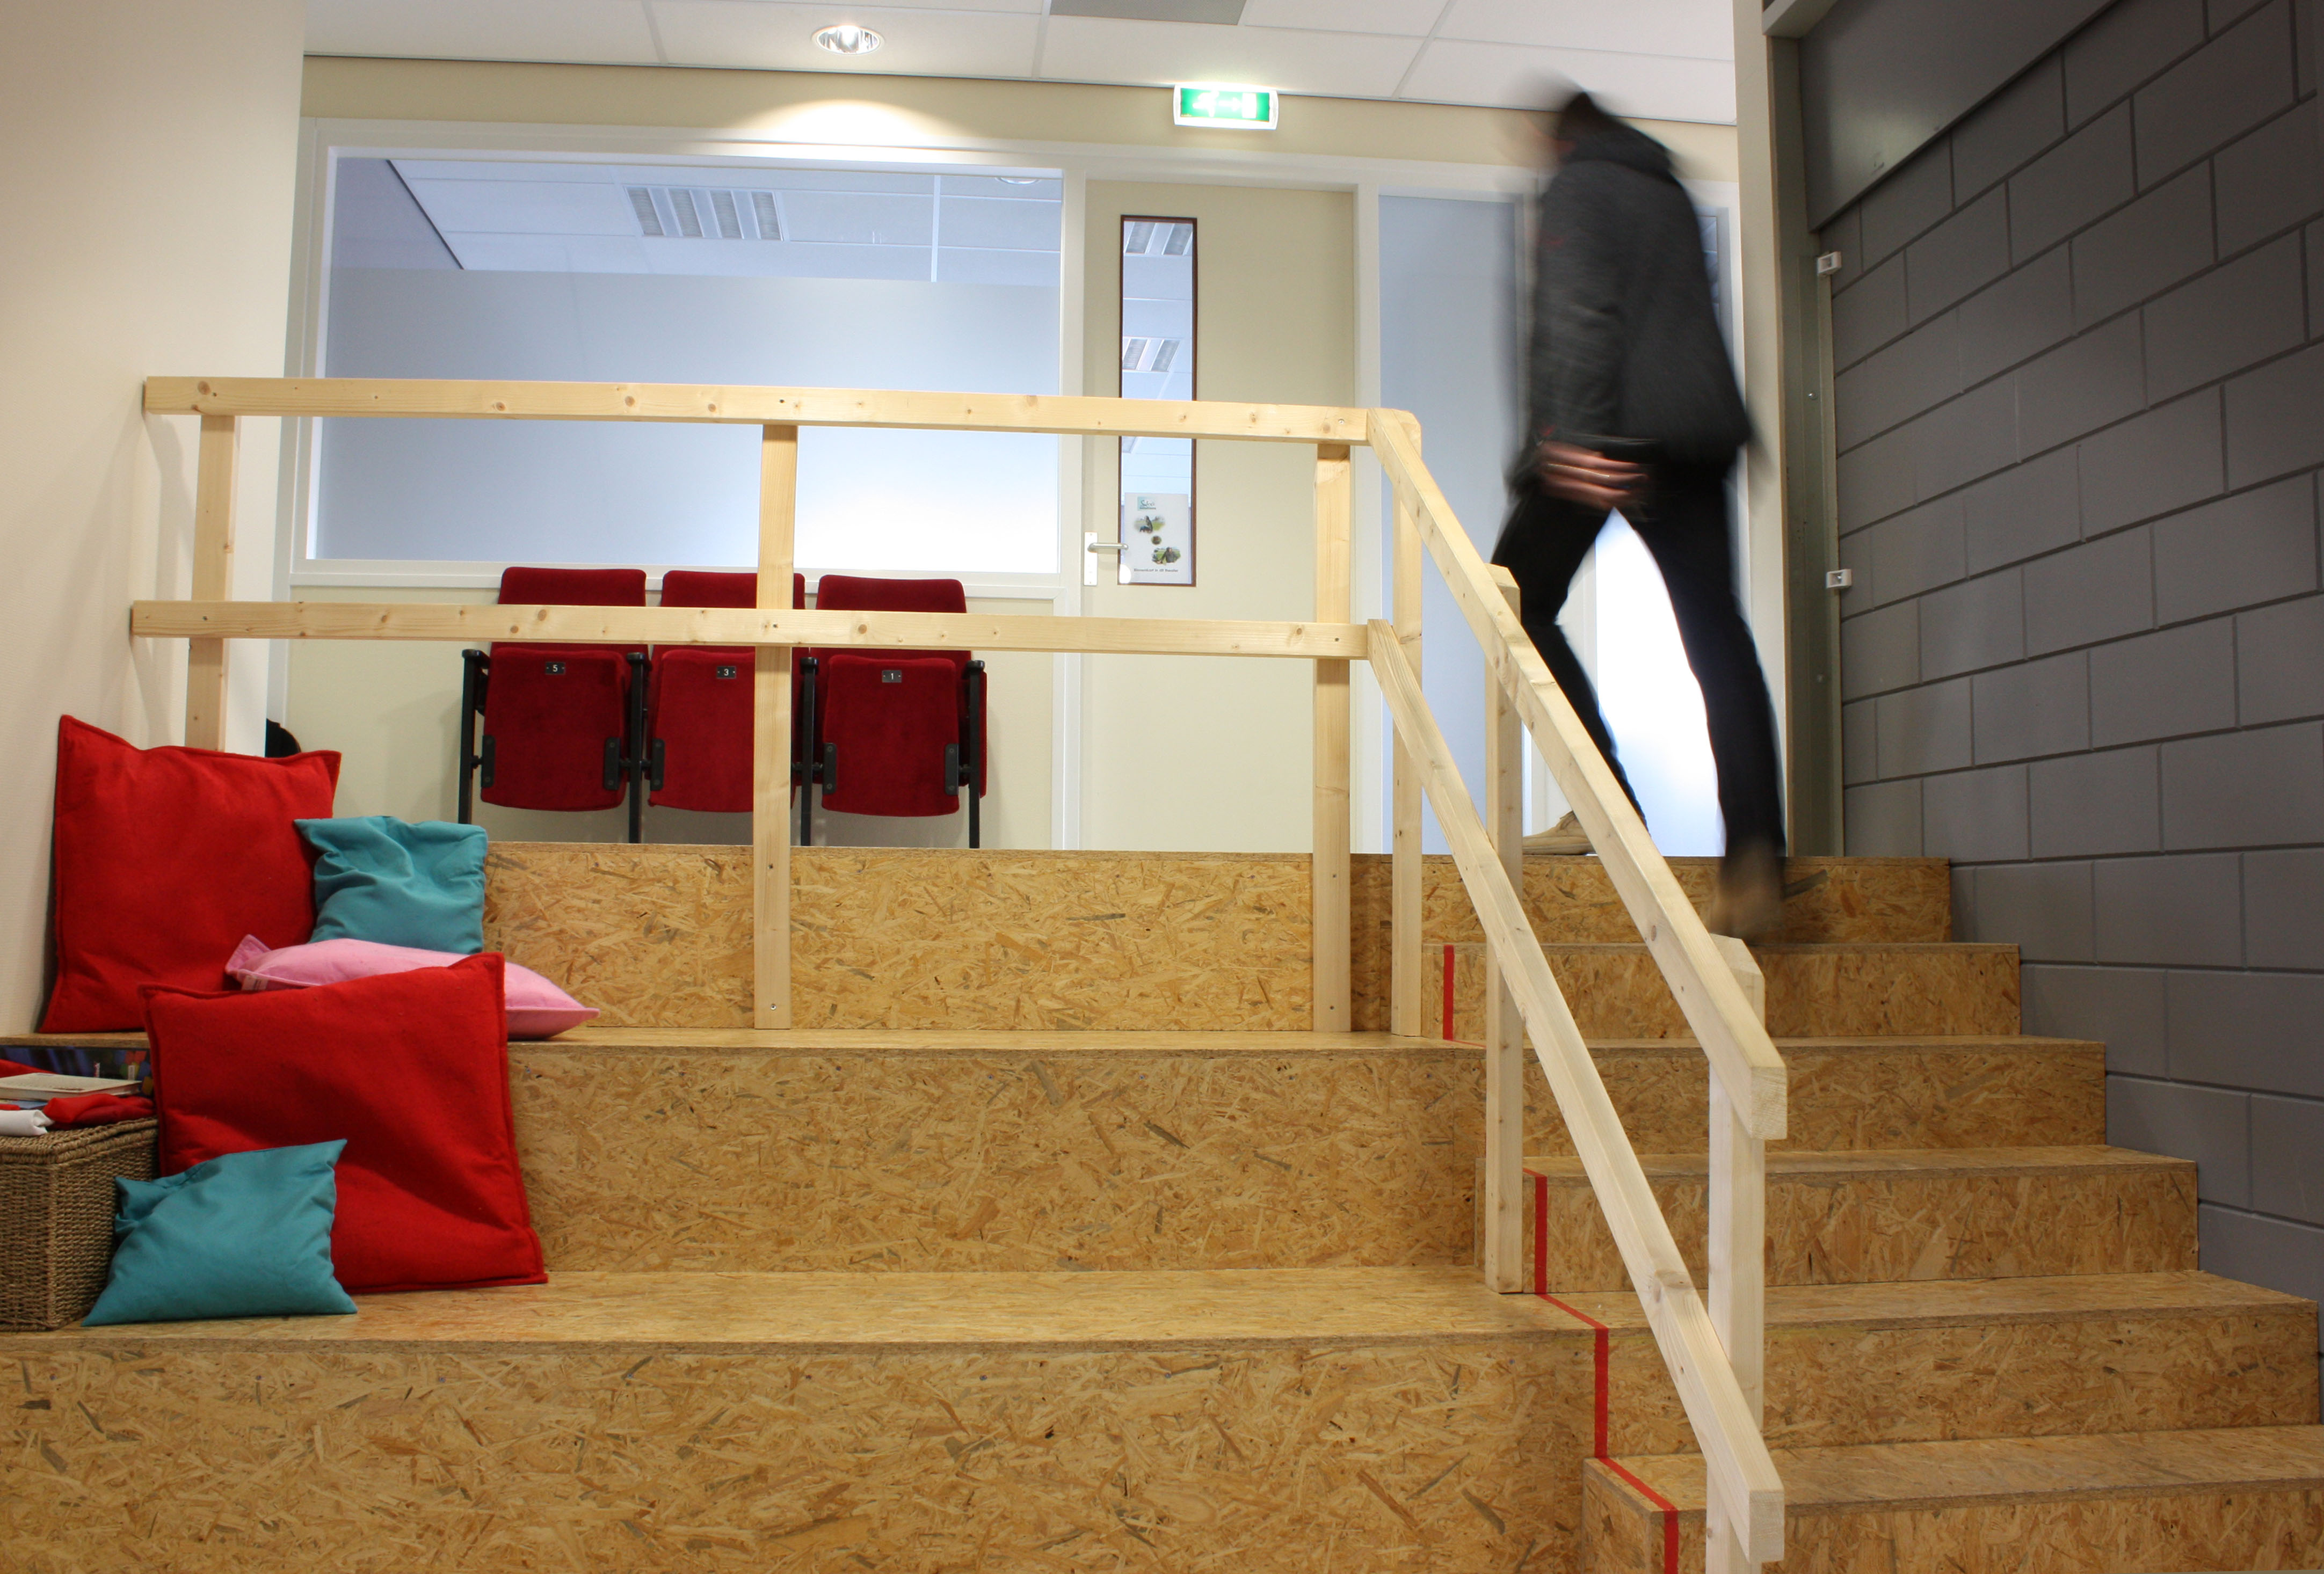 stoel_architect_kampen_duurzaam_bedrijfsgebouw_theater_kampen (12)